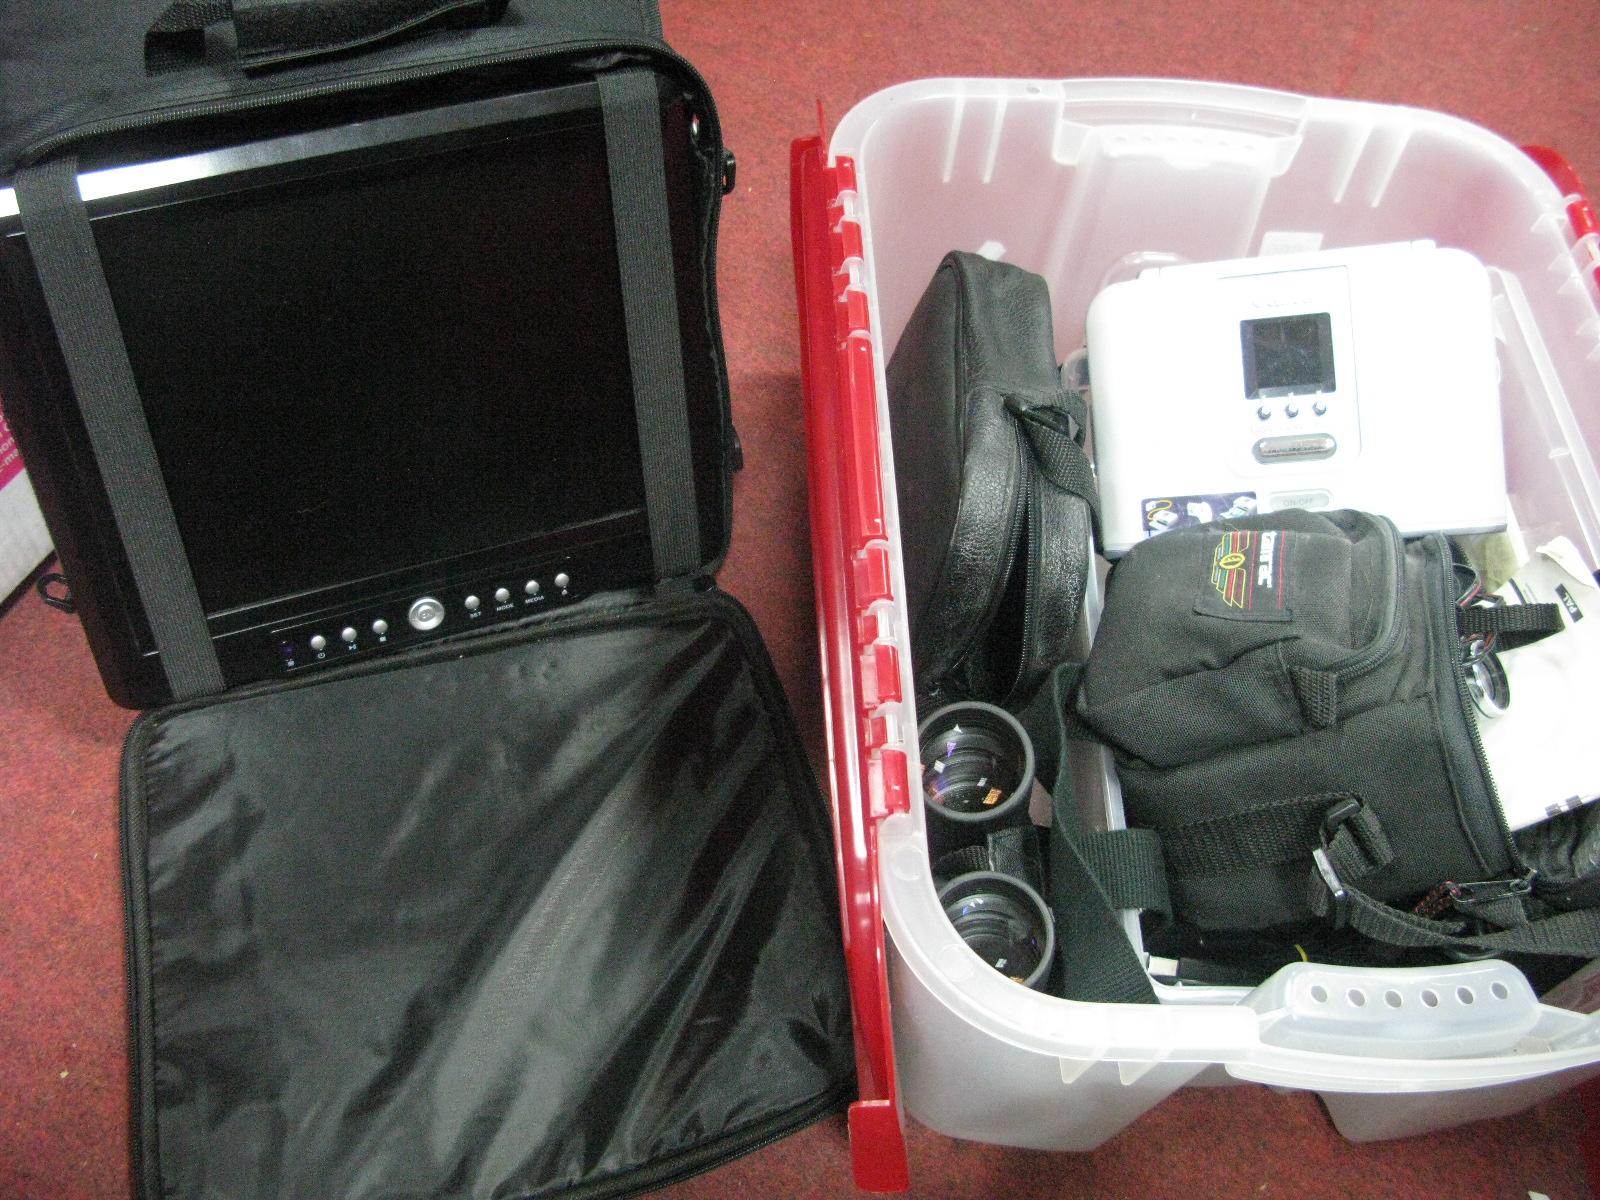 Lot 1095 - Portable DVD Player, Canon digital video camcorder, Opticron 8 x 42 BGA Binoculars, Canon Selphy